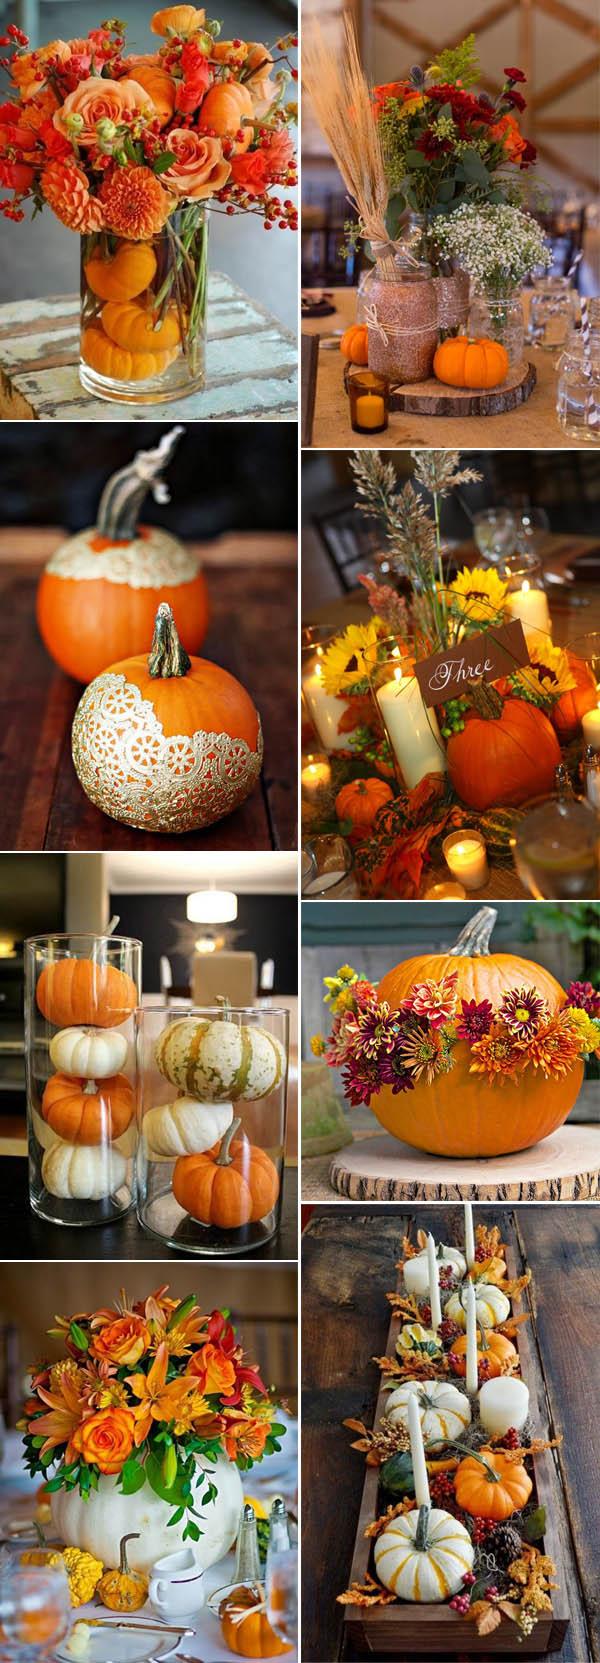 Wedding Decorations Fall 46 Inspirational Fall Autumn Wedding Centerpieces Ideas